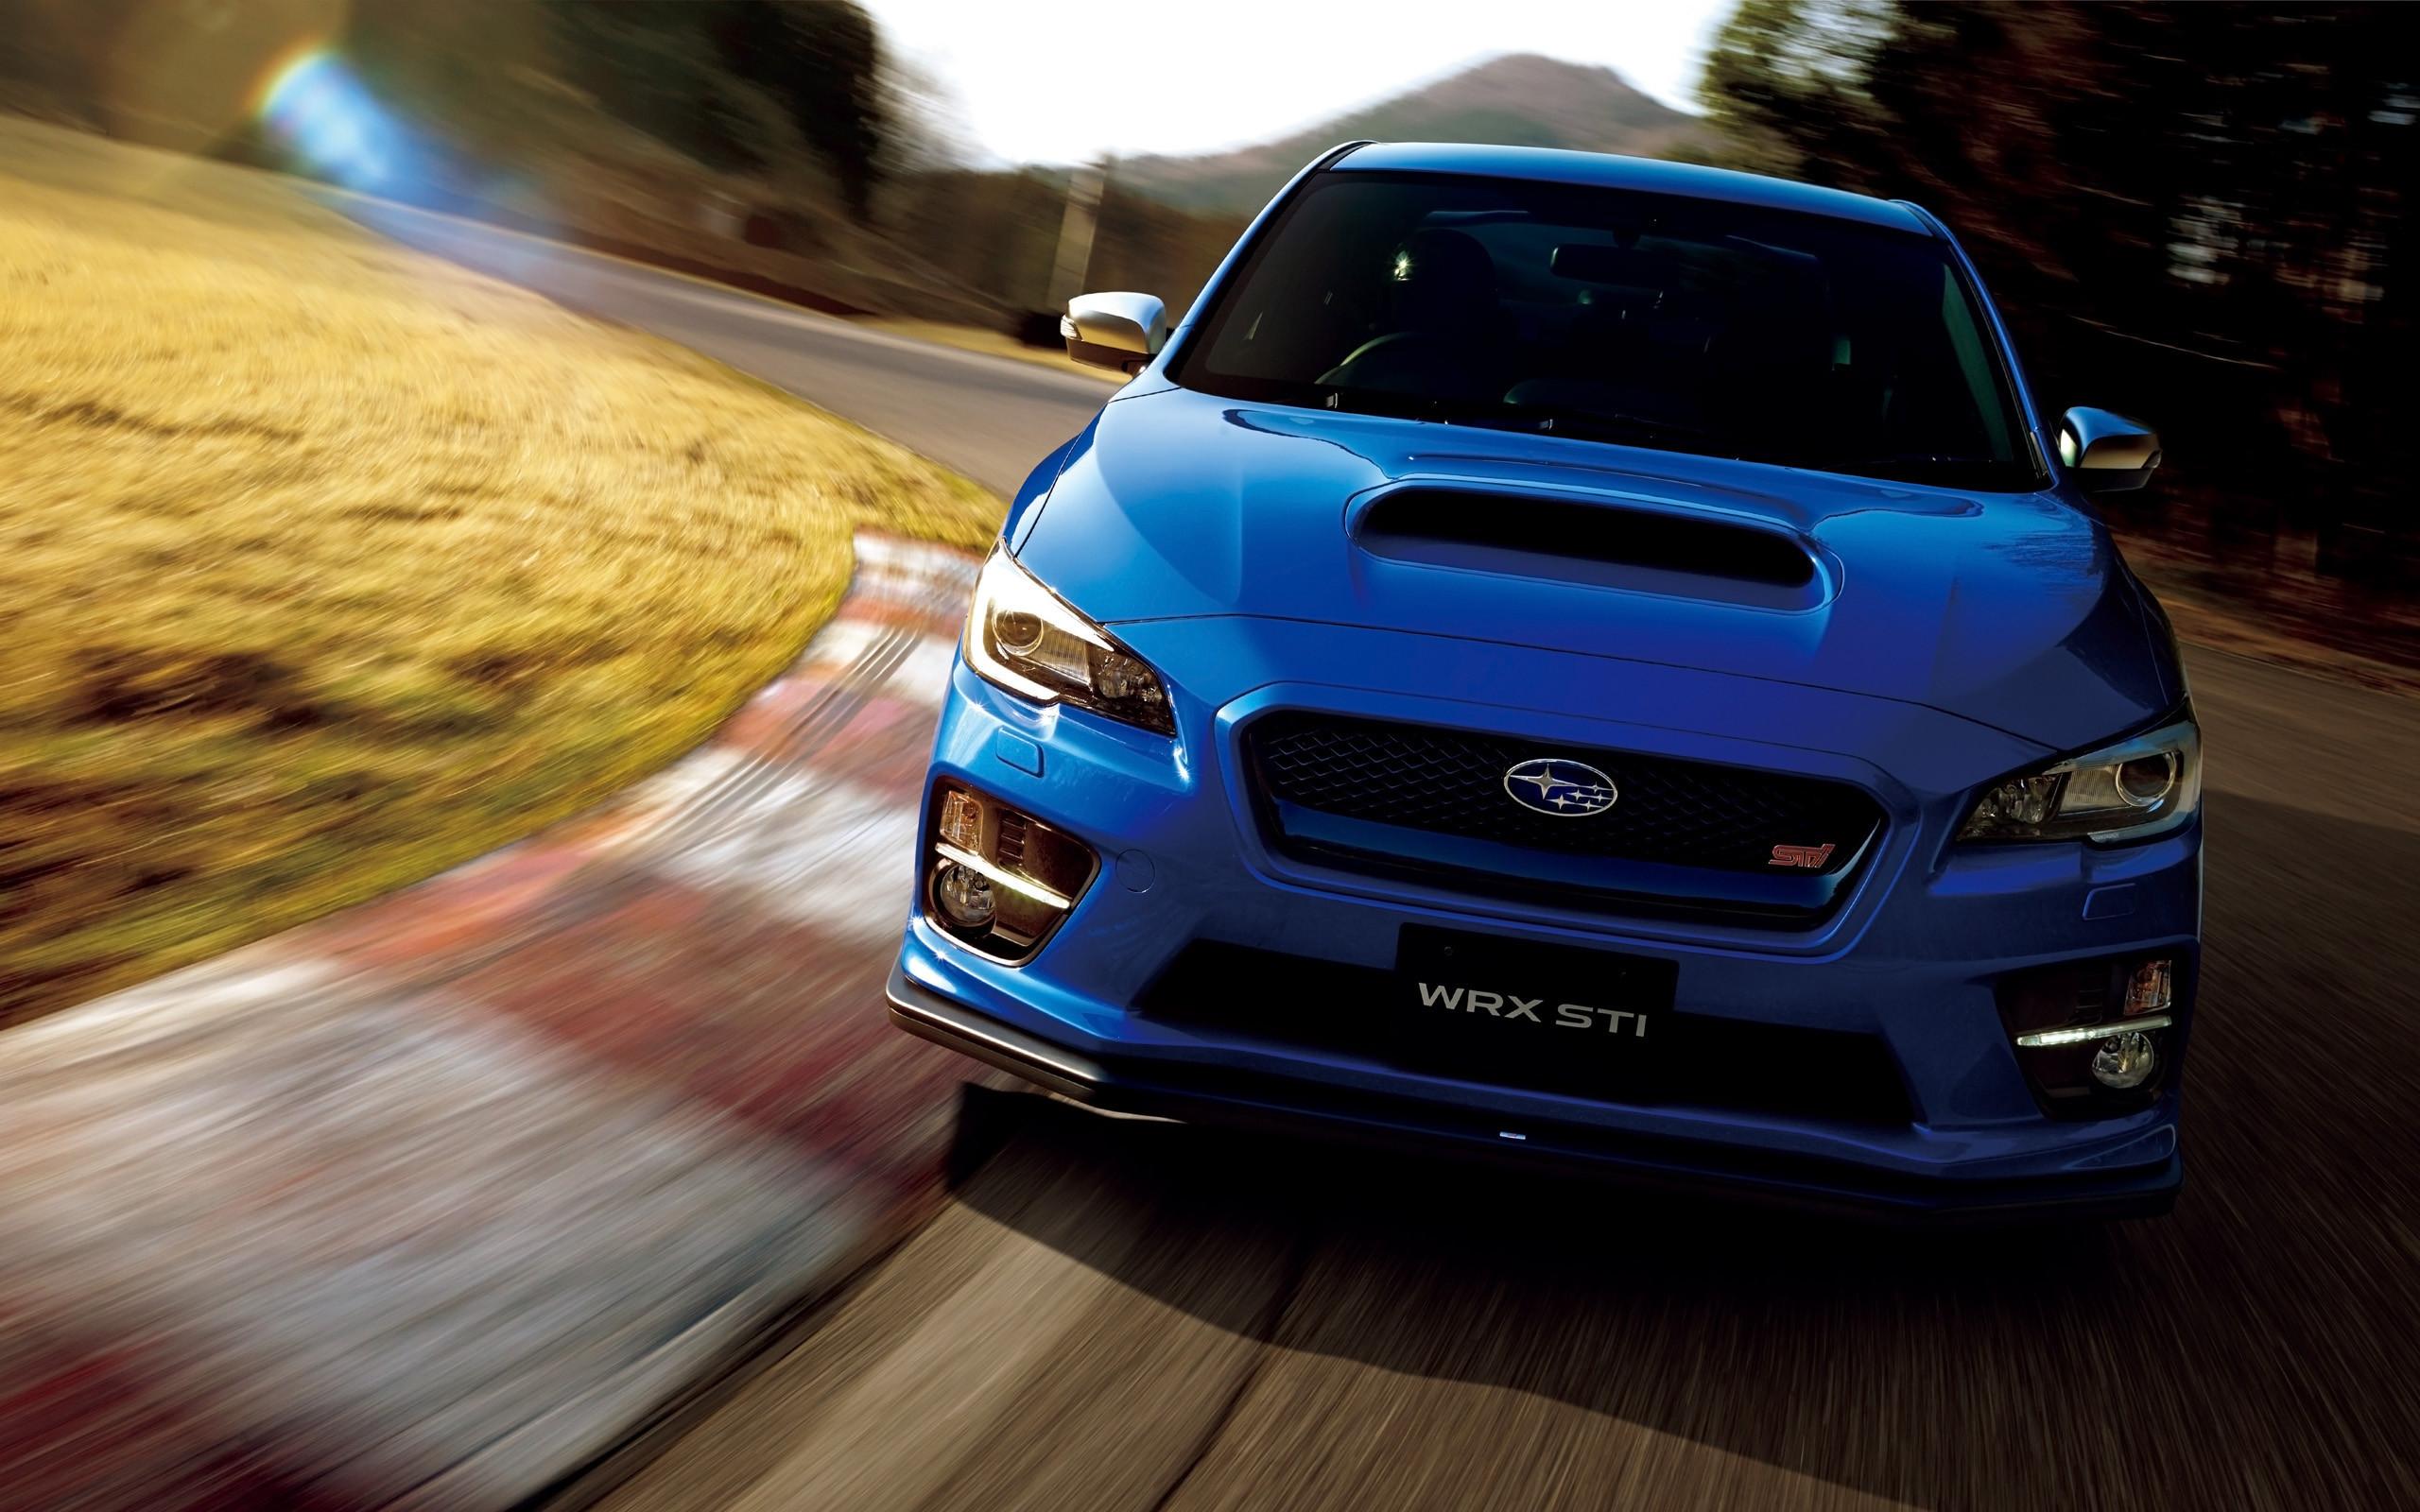 Res: 2560x1600, 2015 Subaru WRX STI Japan Wallpaper